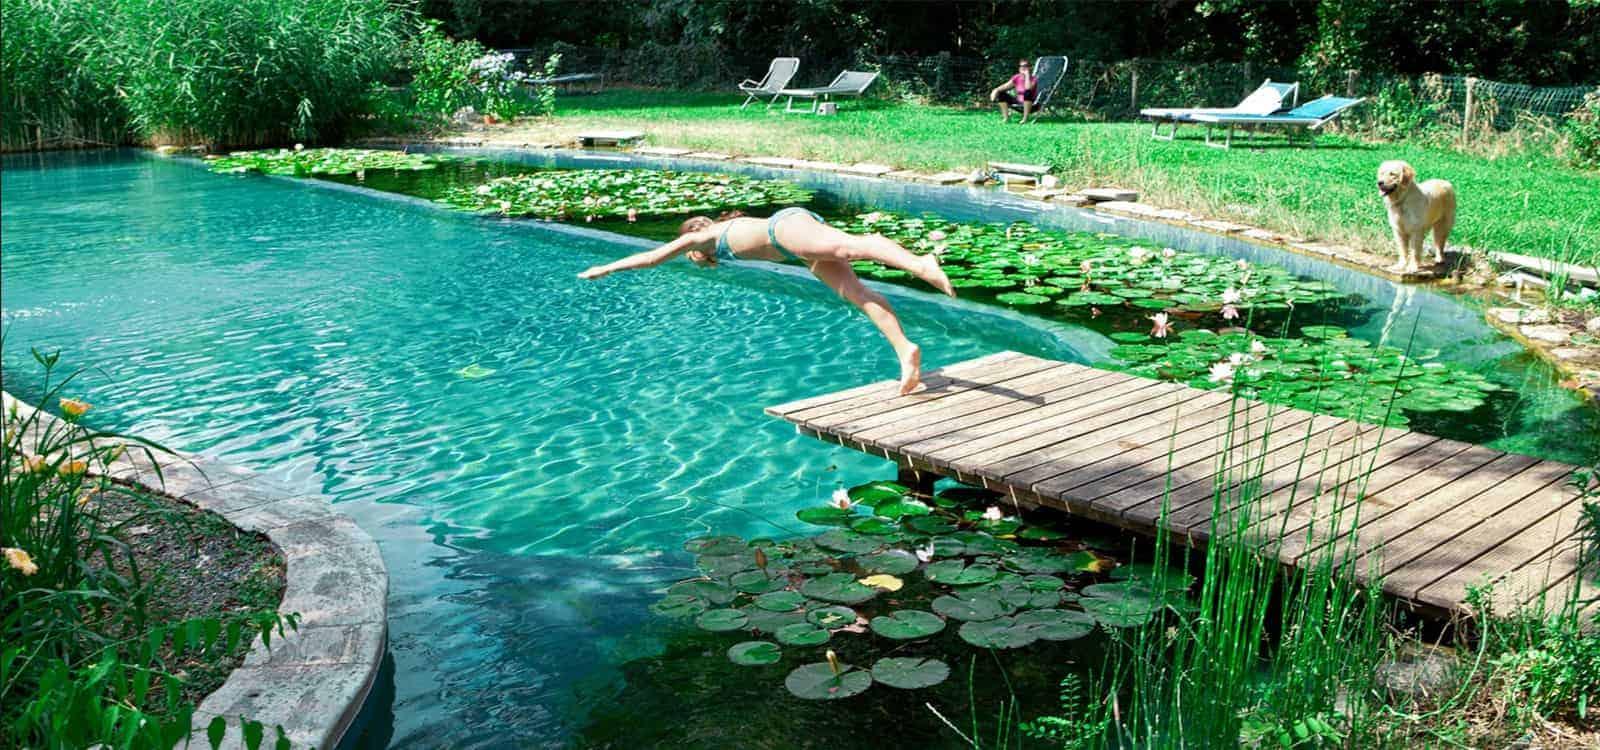 Voir Piscine Hors Sol comment installer vos propres piscines creusées et hors sol